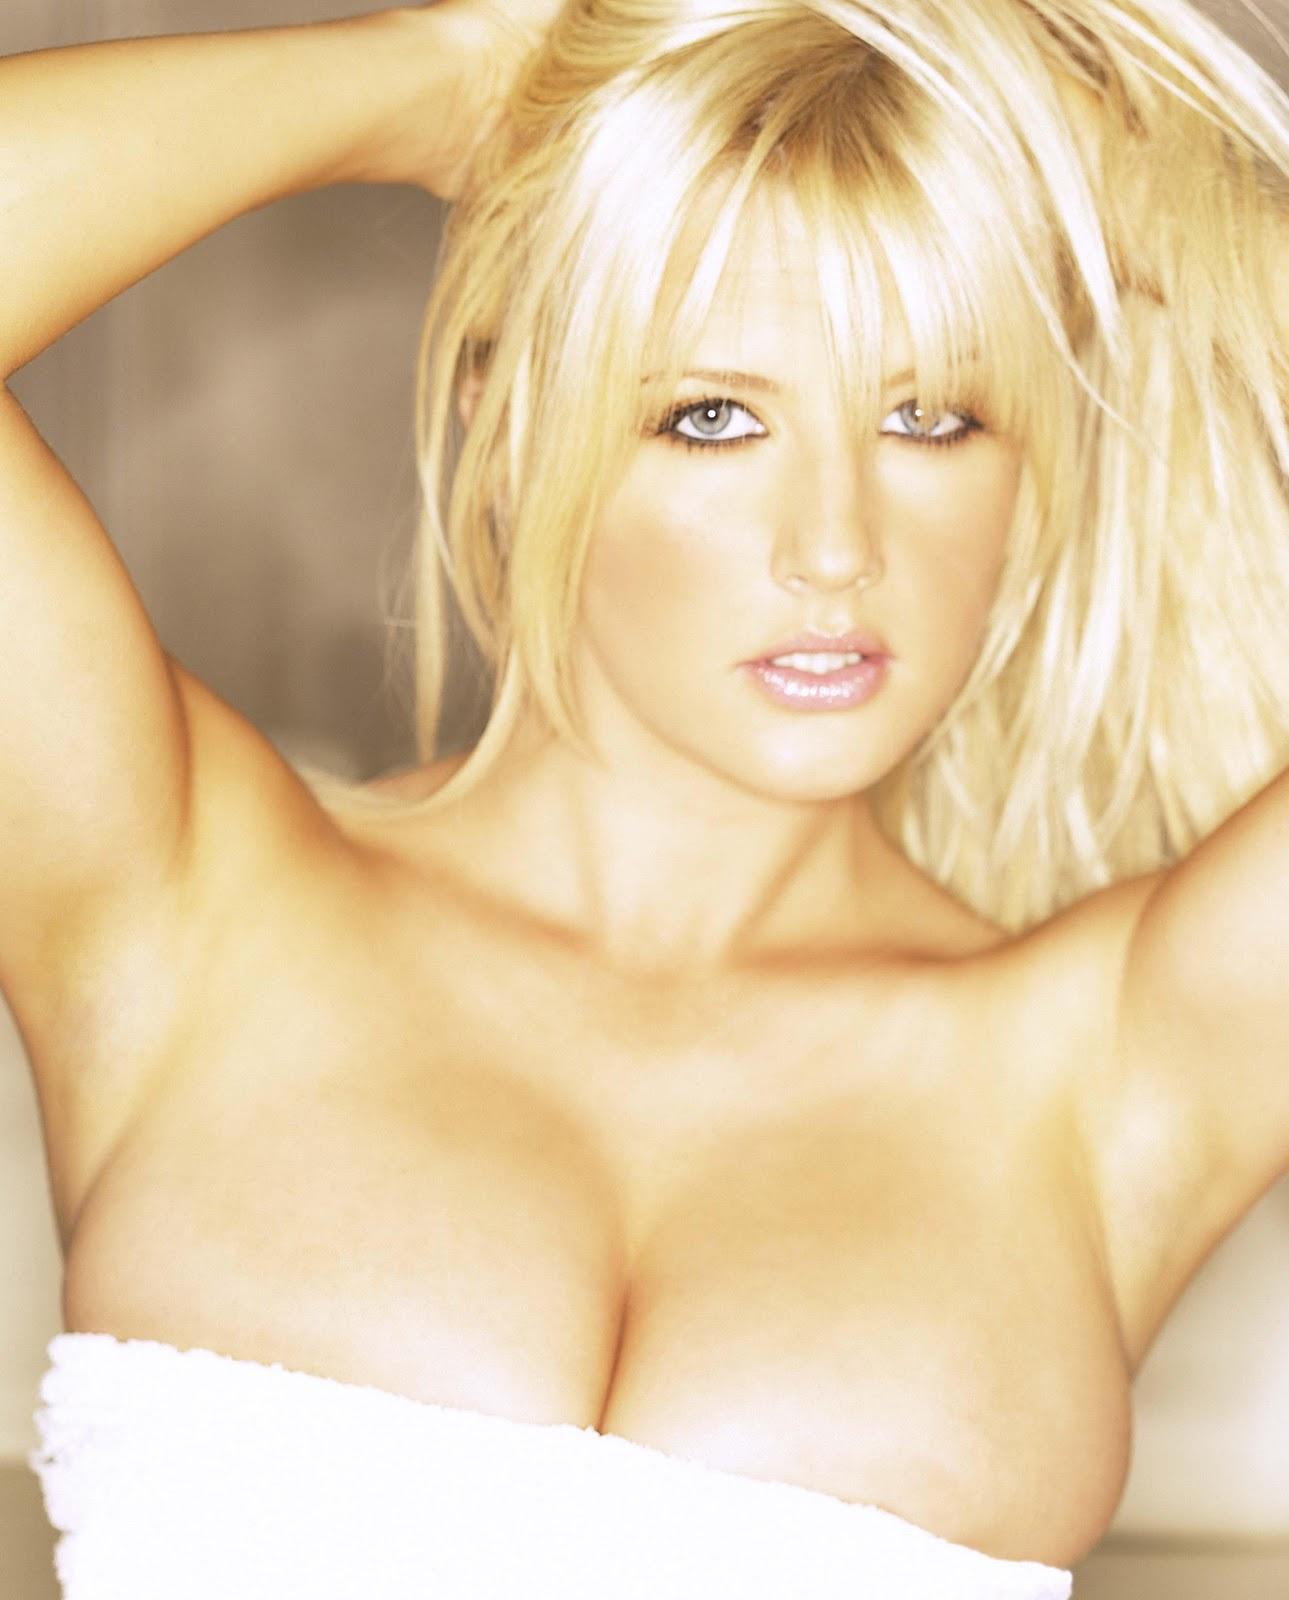 female celebrity michelle marsh - photo #10